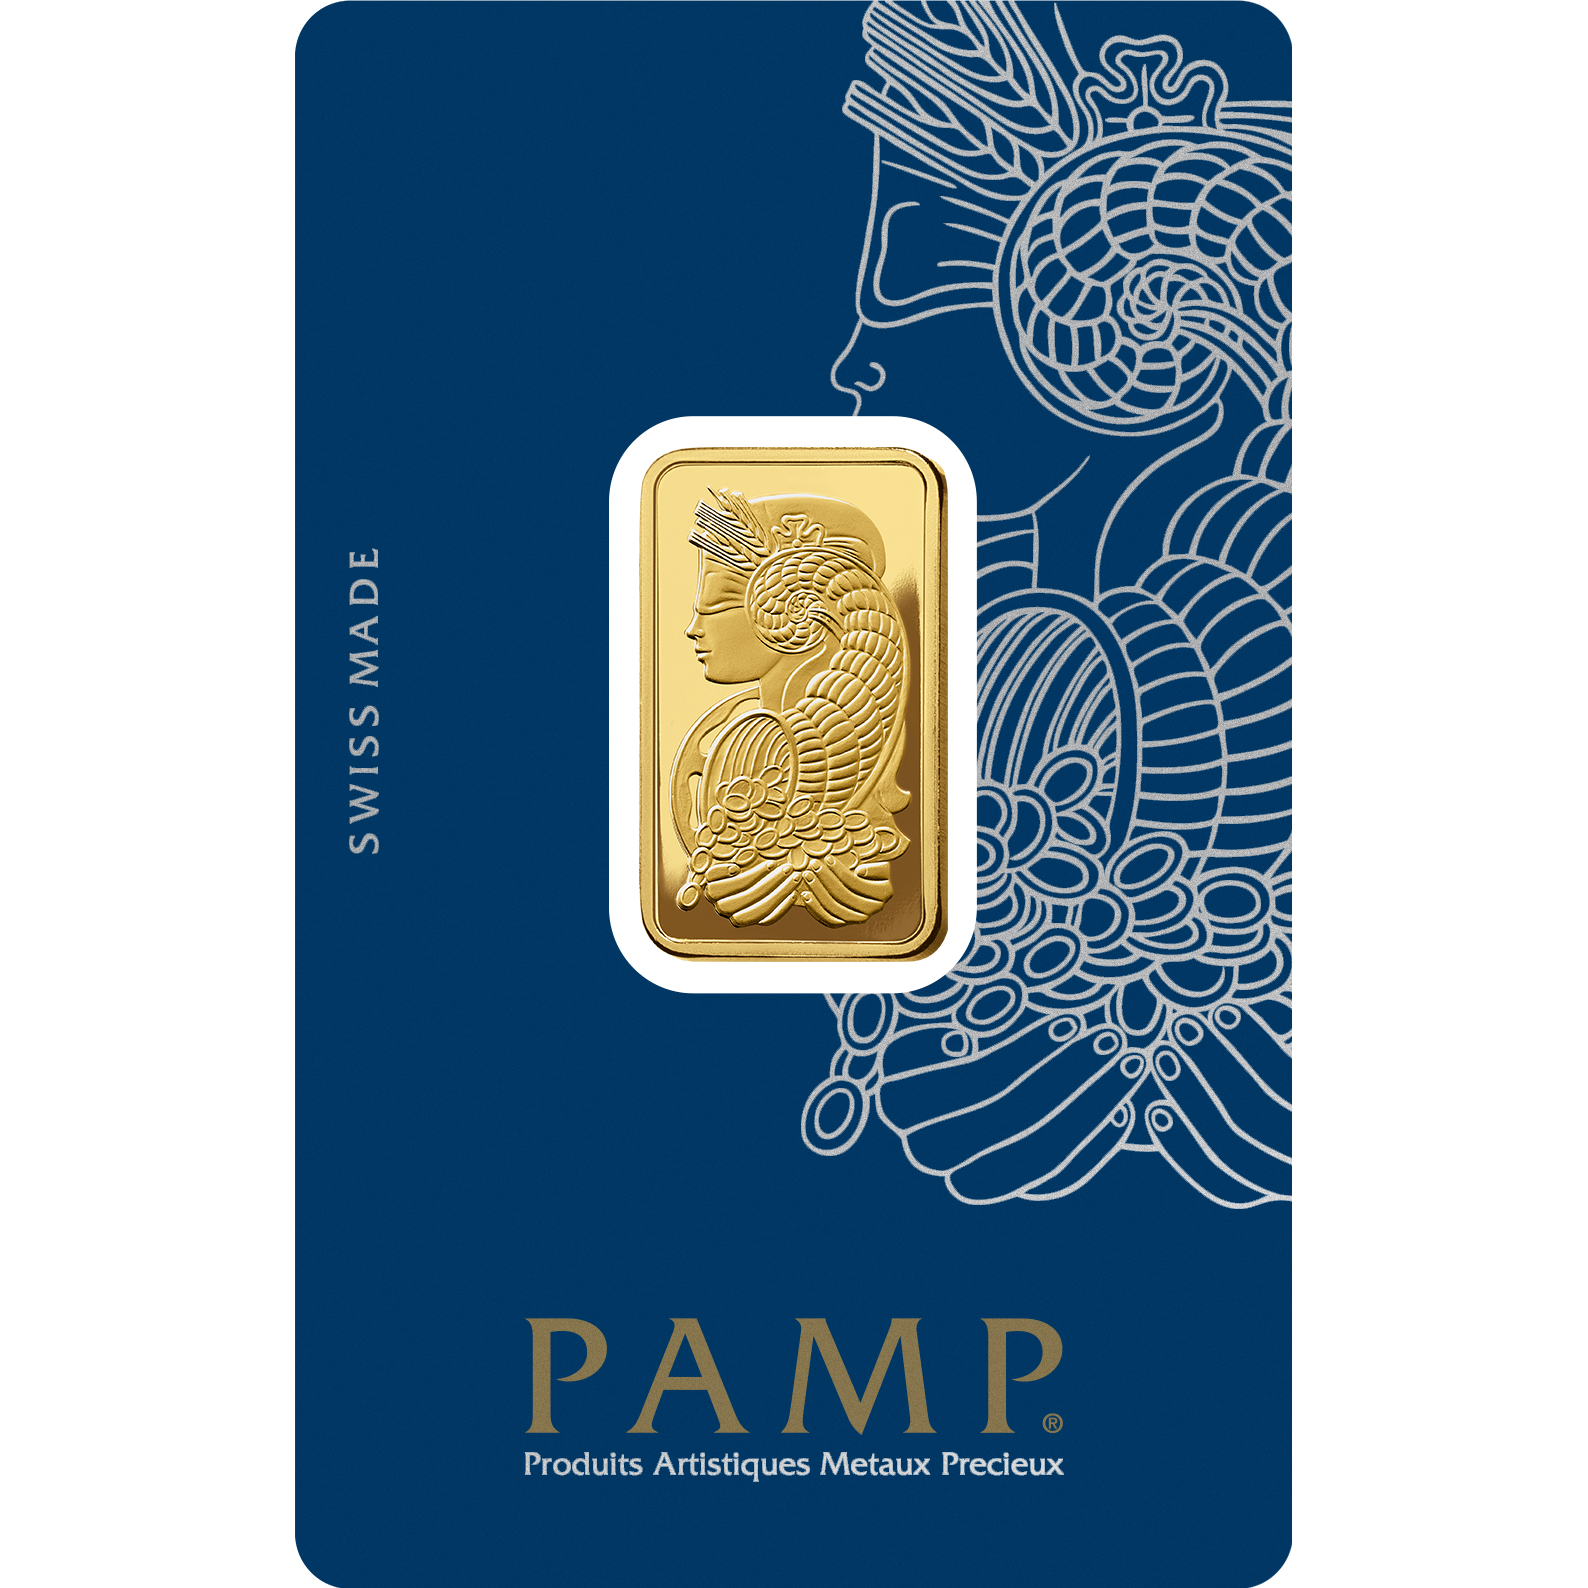 1 tola lingottino d'oro puro 999.9 - PAMP Suisse Lady Fortuna Veriscan